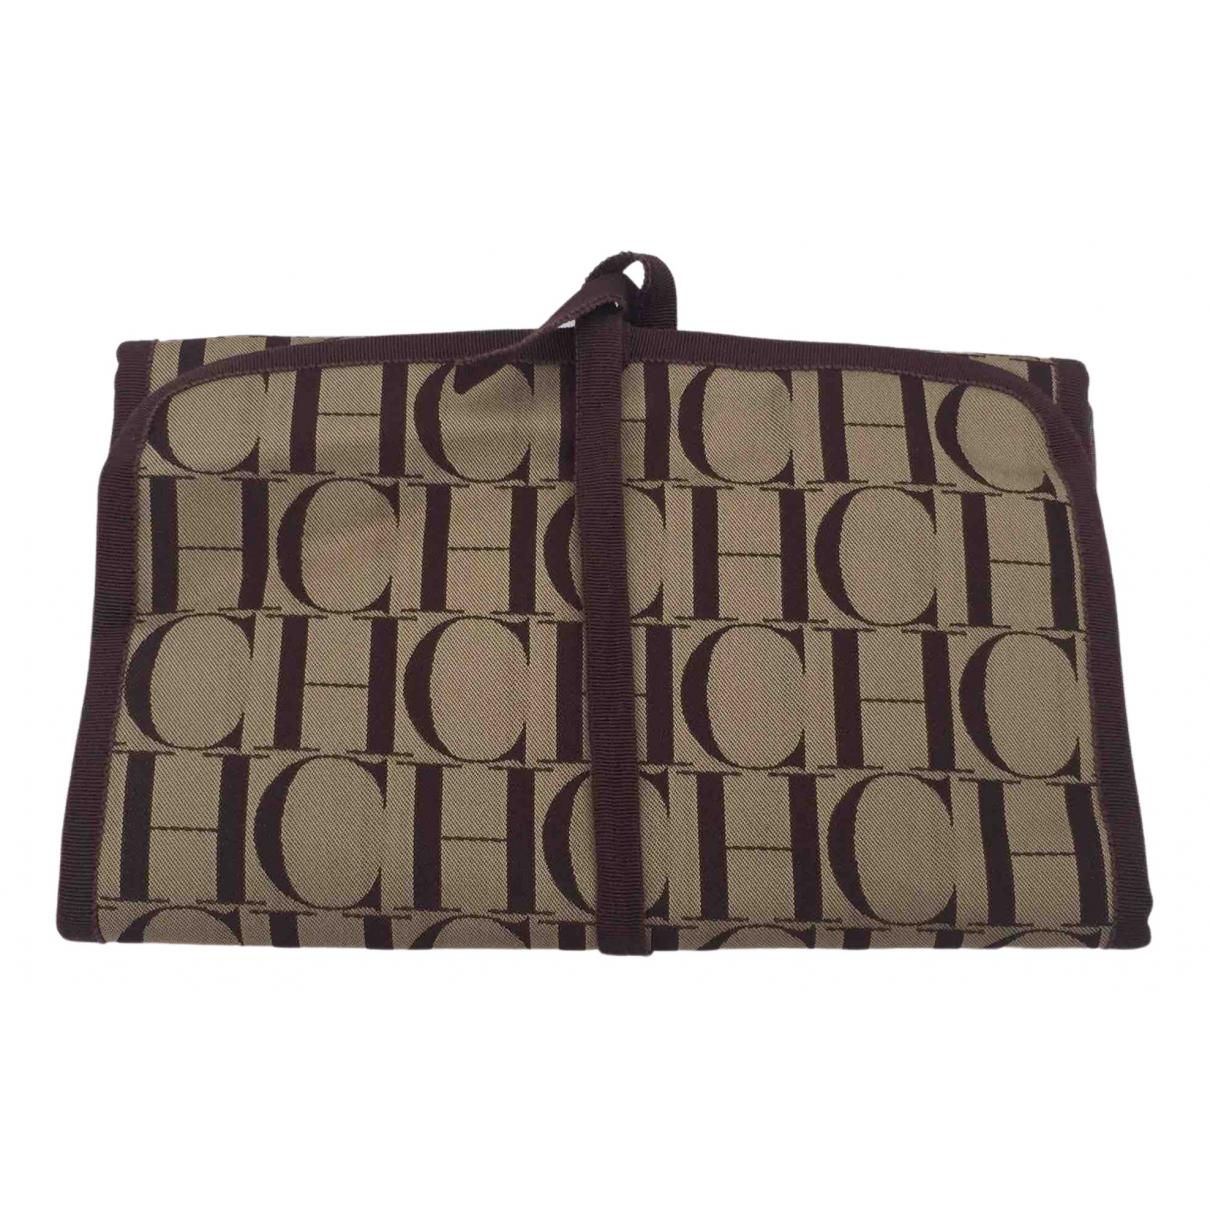 Carolina Herrera \N Cloth handbag for Women \N